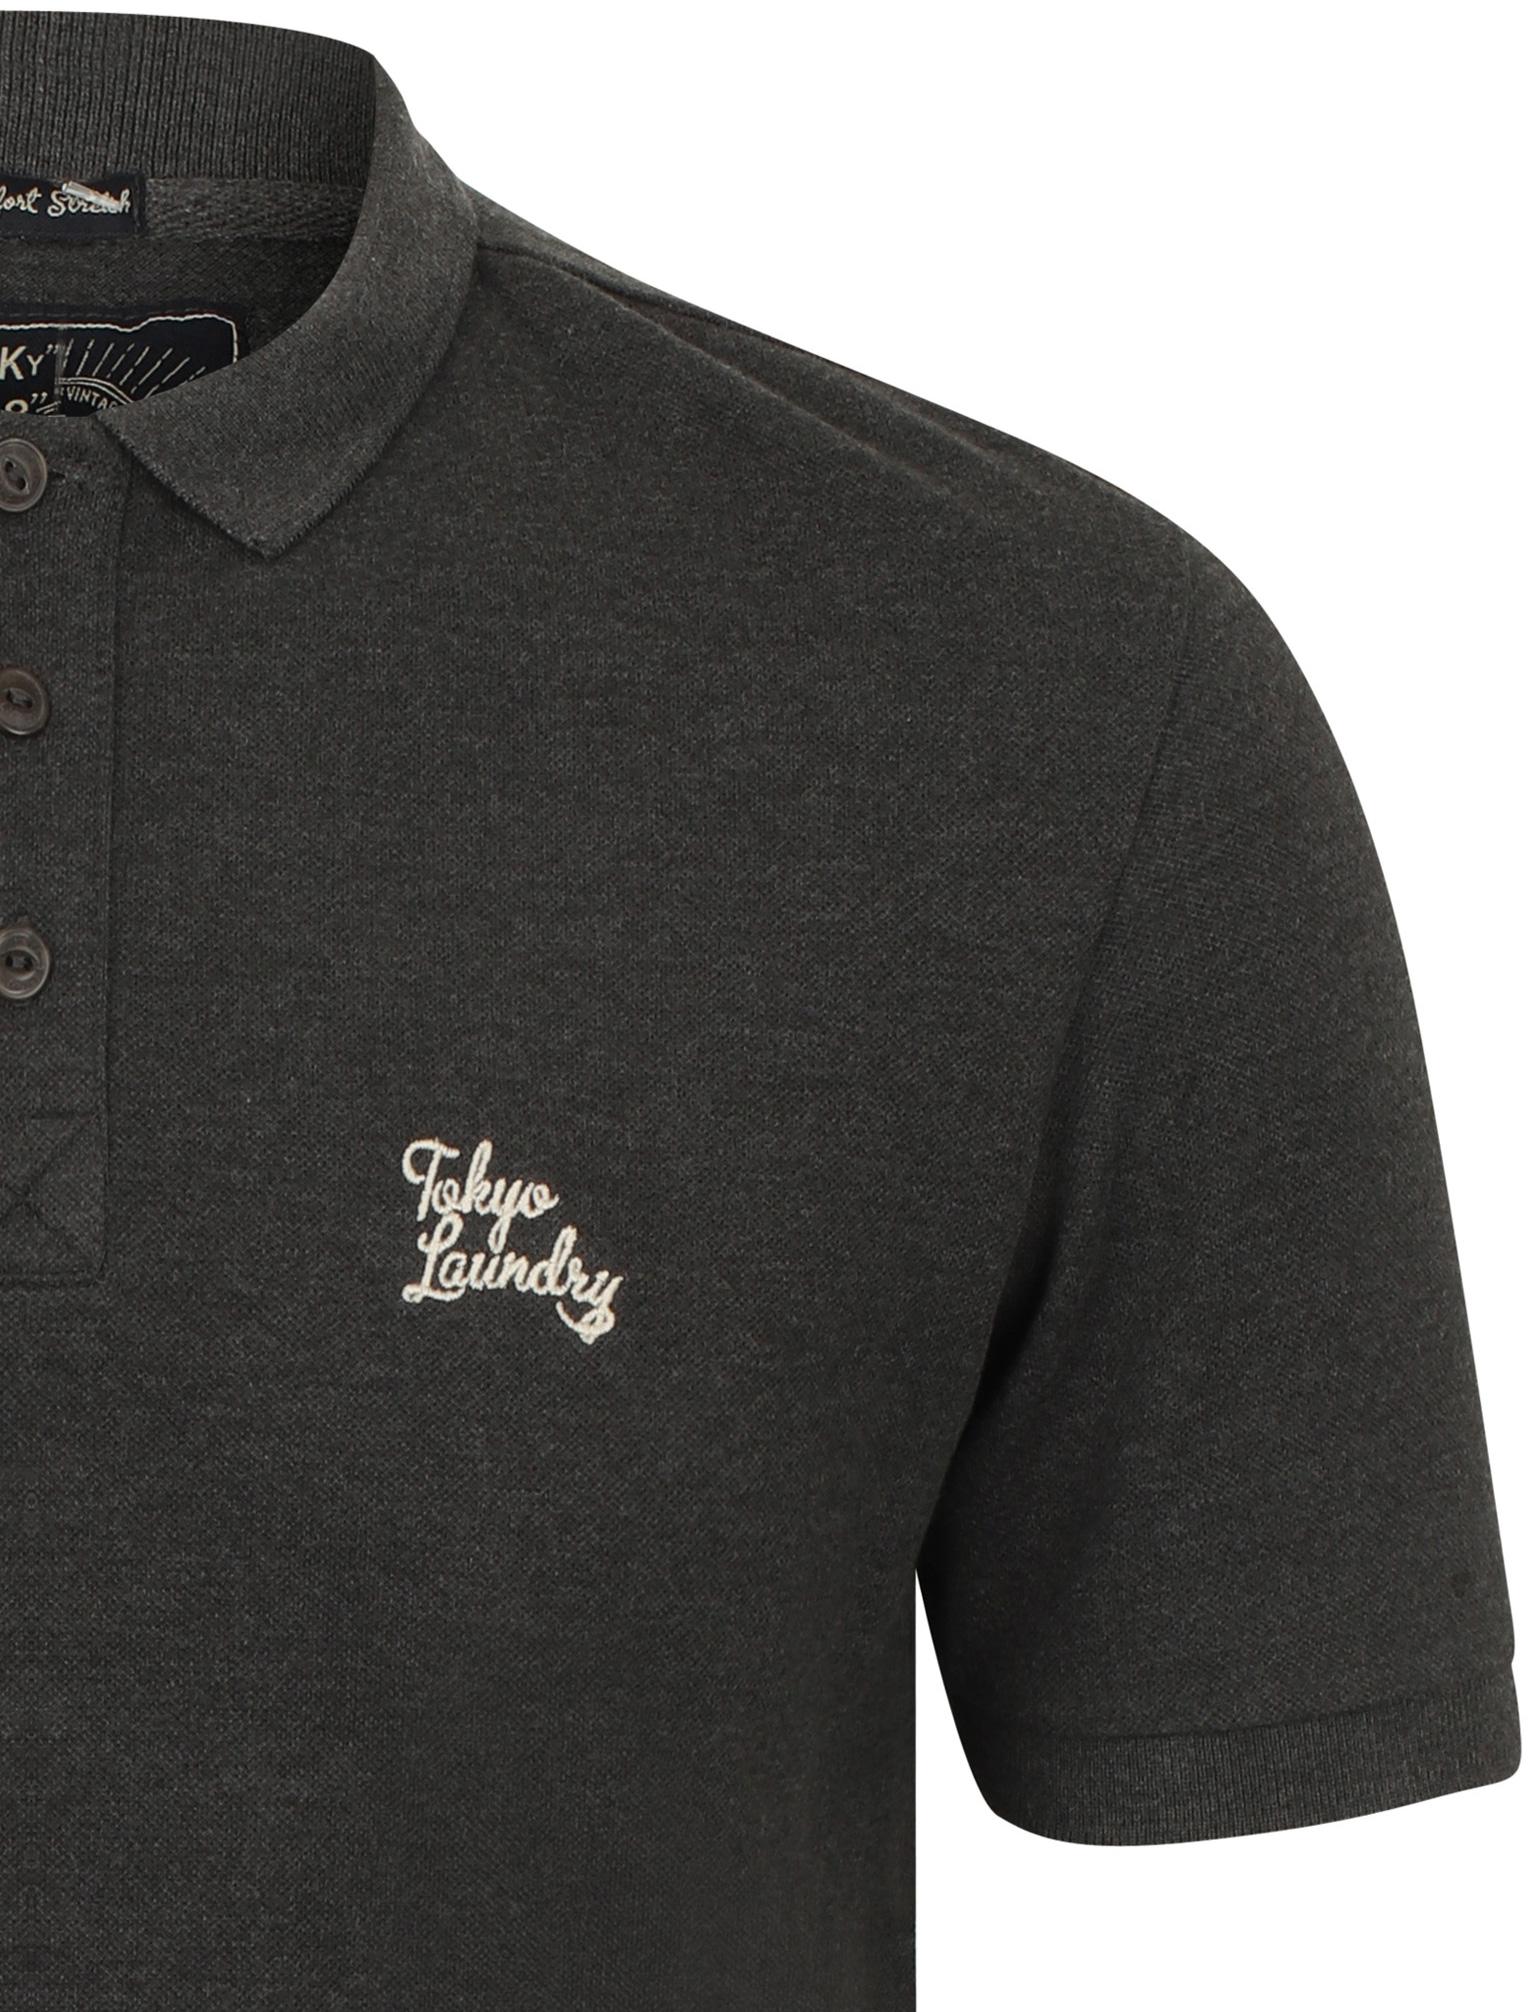 New-Mens-Tokyo-Laundry-Branded-Kuusamo-Cotton-Rich-Pique-Polo-Shirt-Size-S-XXL thumbnail 18